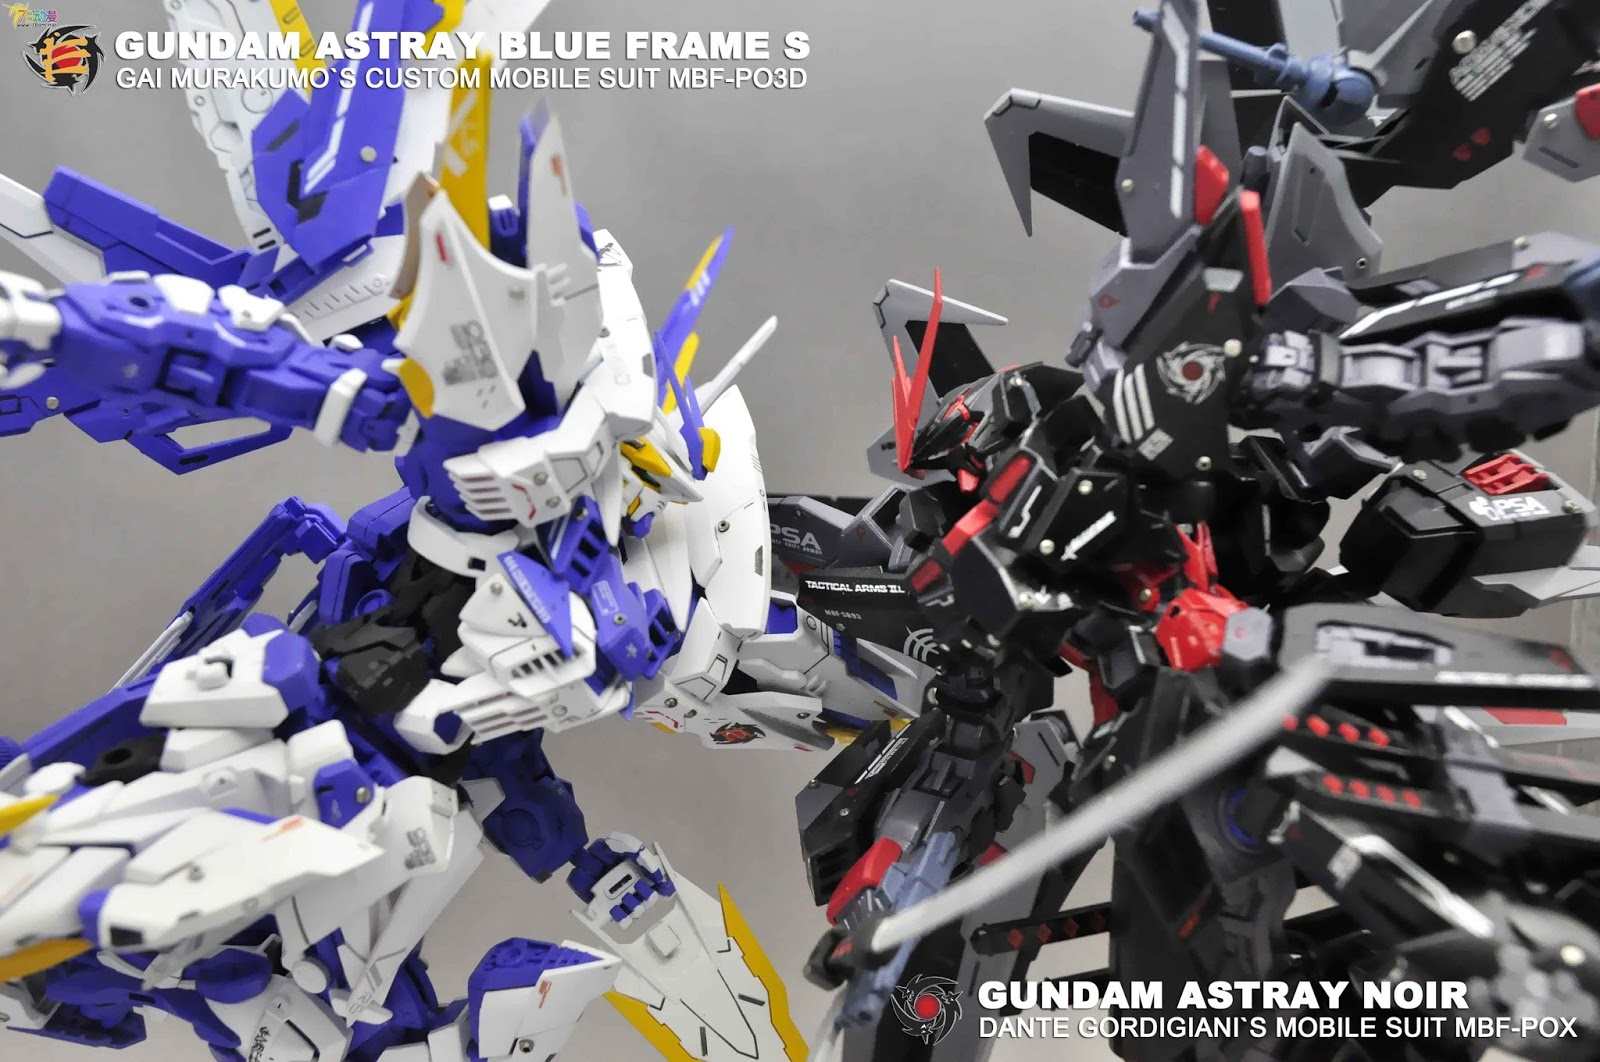 MG 1/100 Gundam Astray Blue Frame S + Gundam Astray Noir - Customized Build